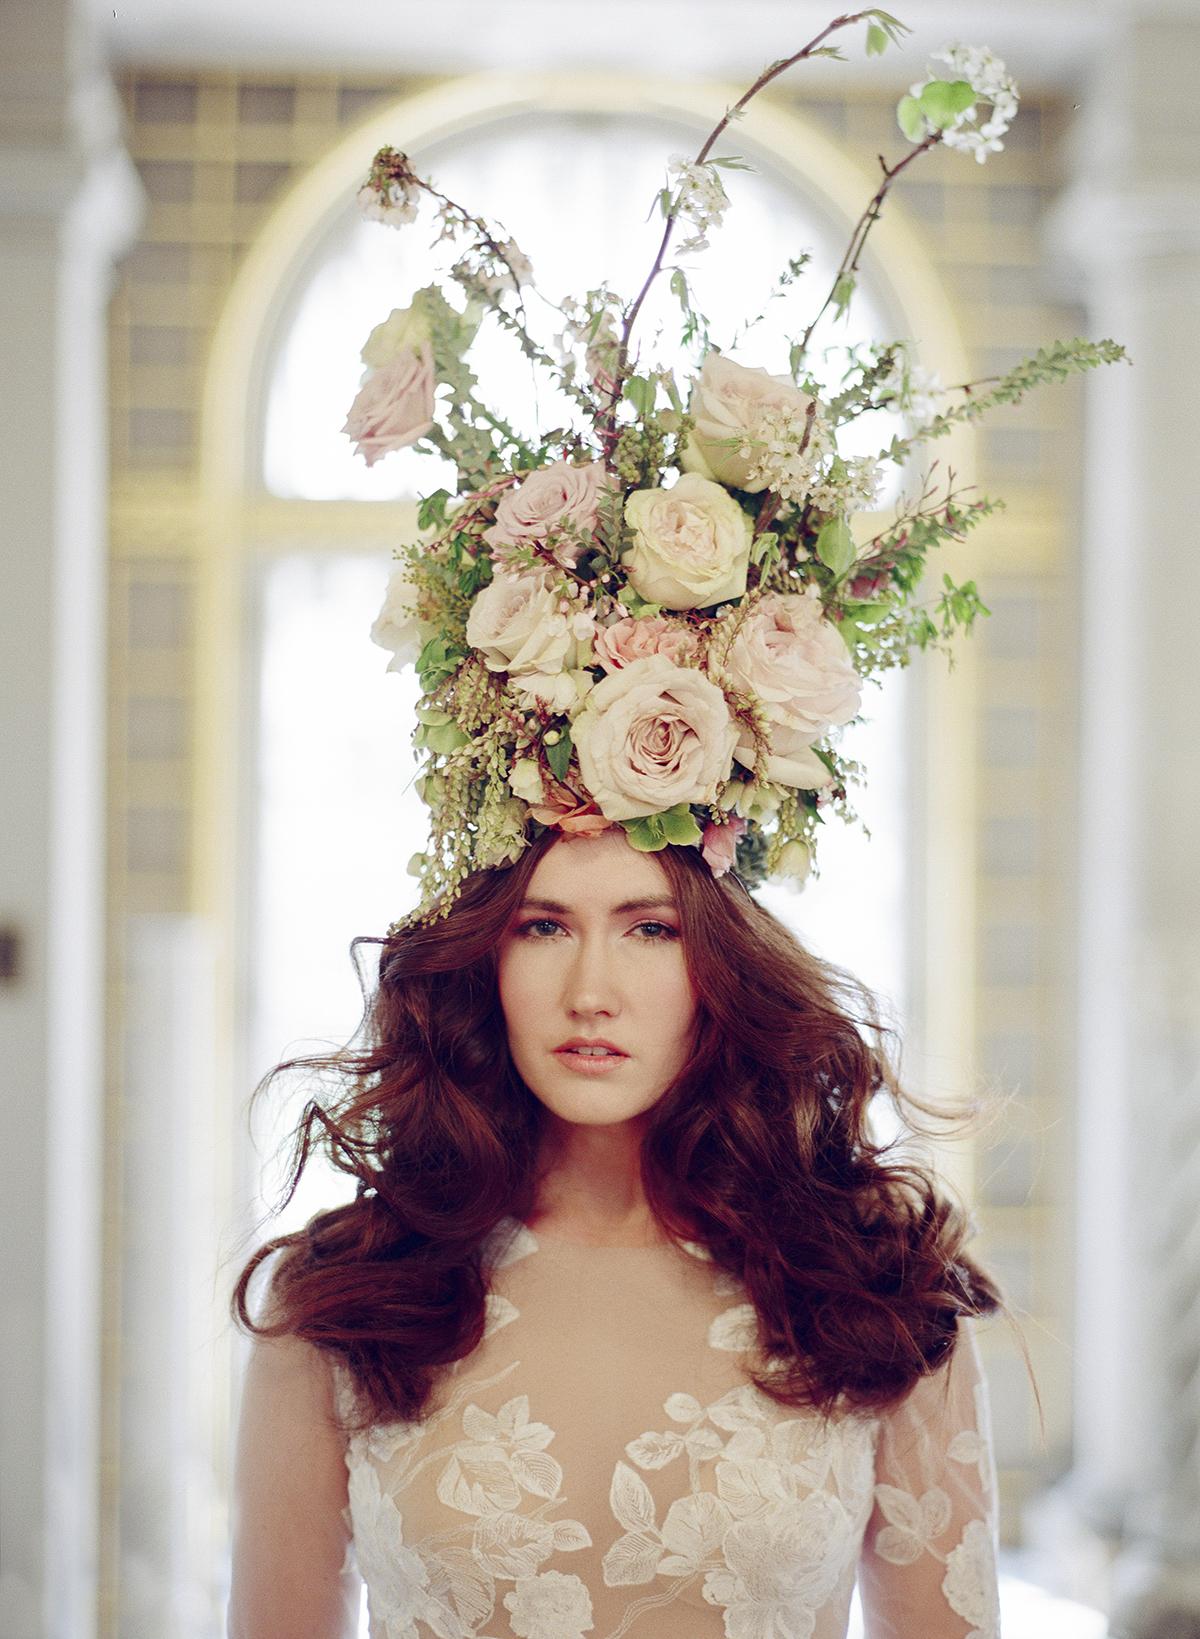 Dramatic Flower Headpiece for Bride